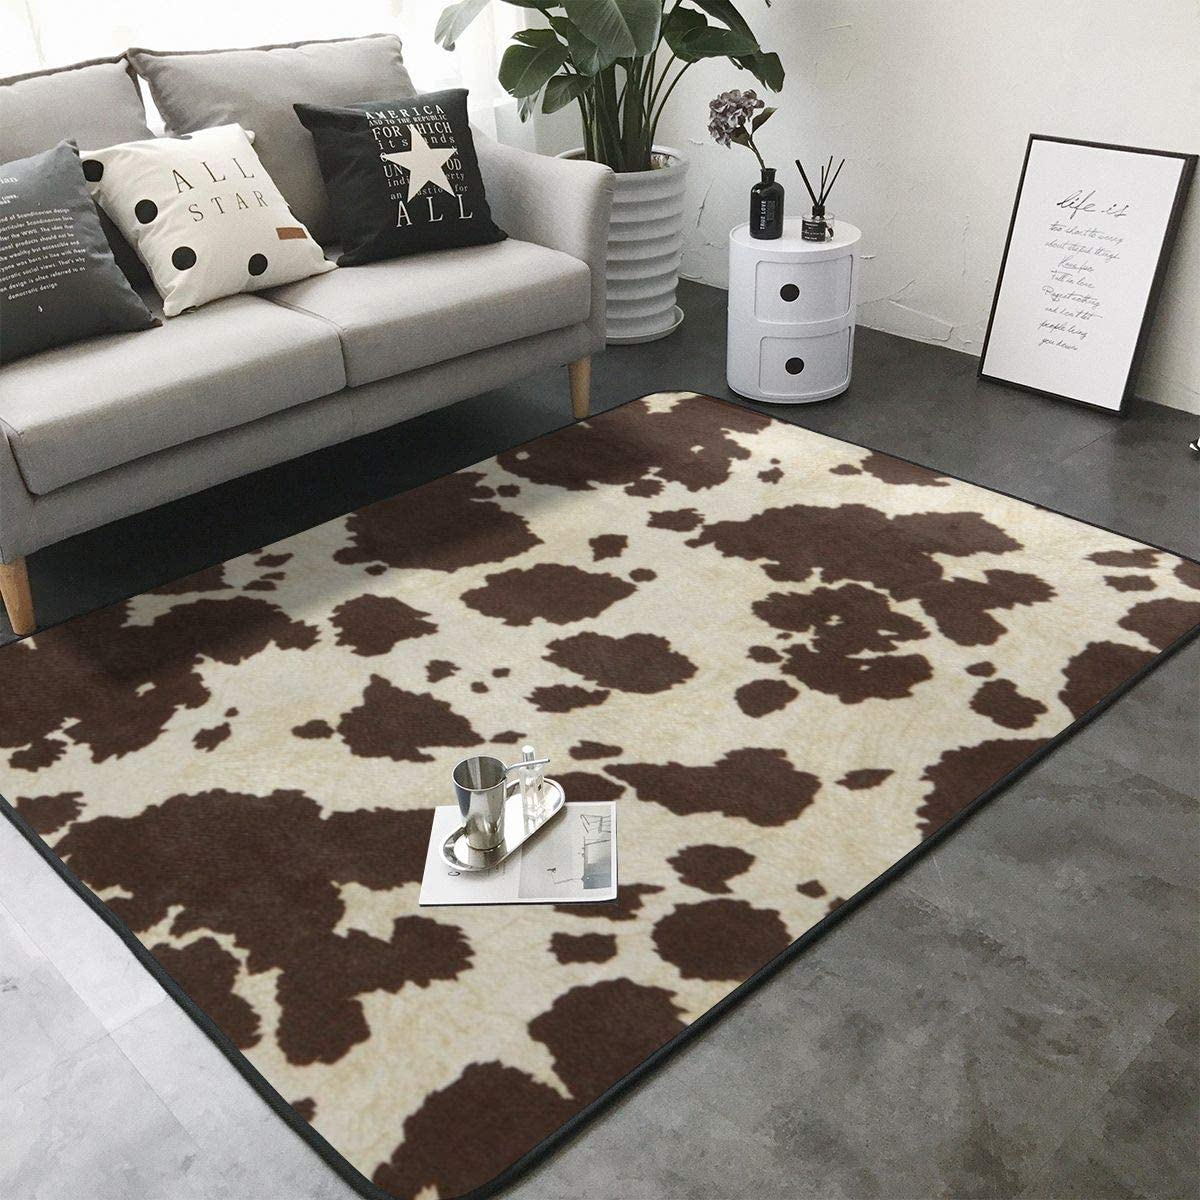 ROCKSKY Cow Print Area Max 41% OFF trust Rugs Rug Sitting-Room Bedroom Livingroom